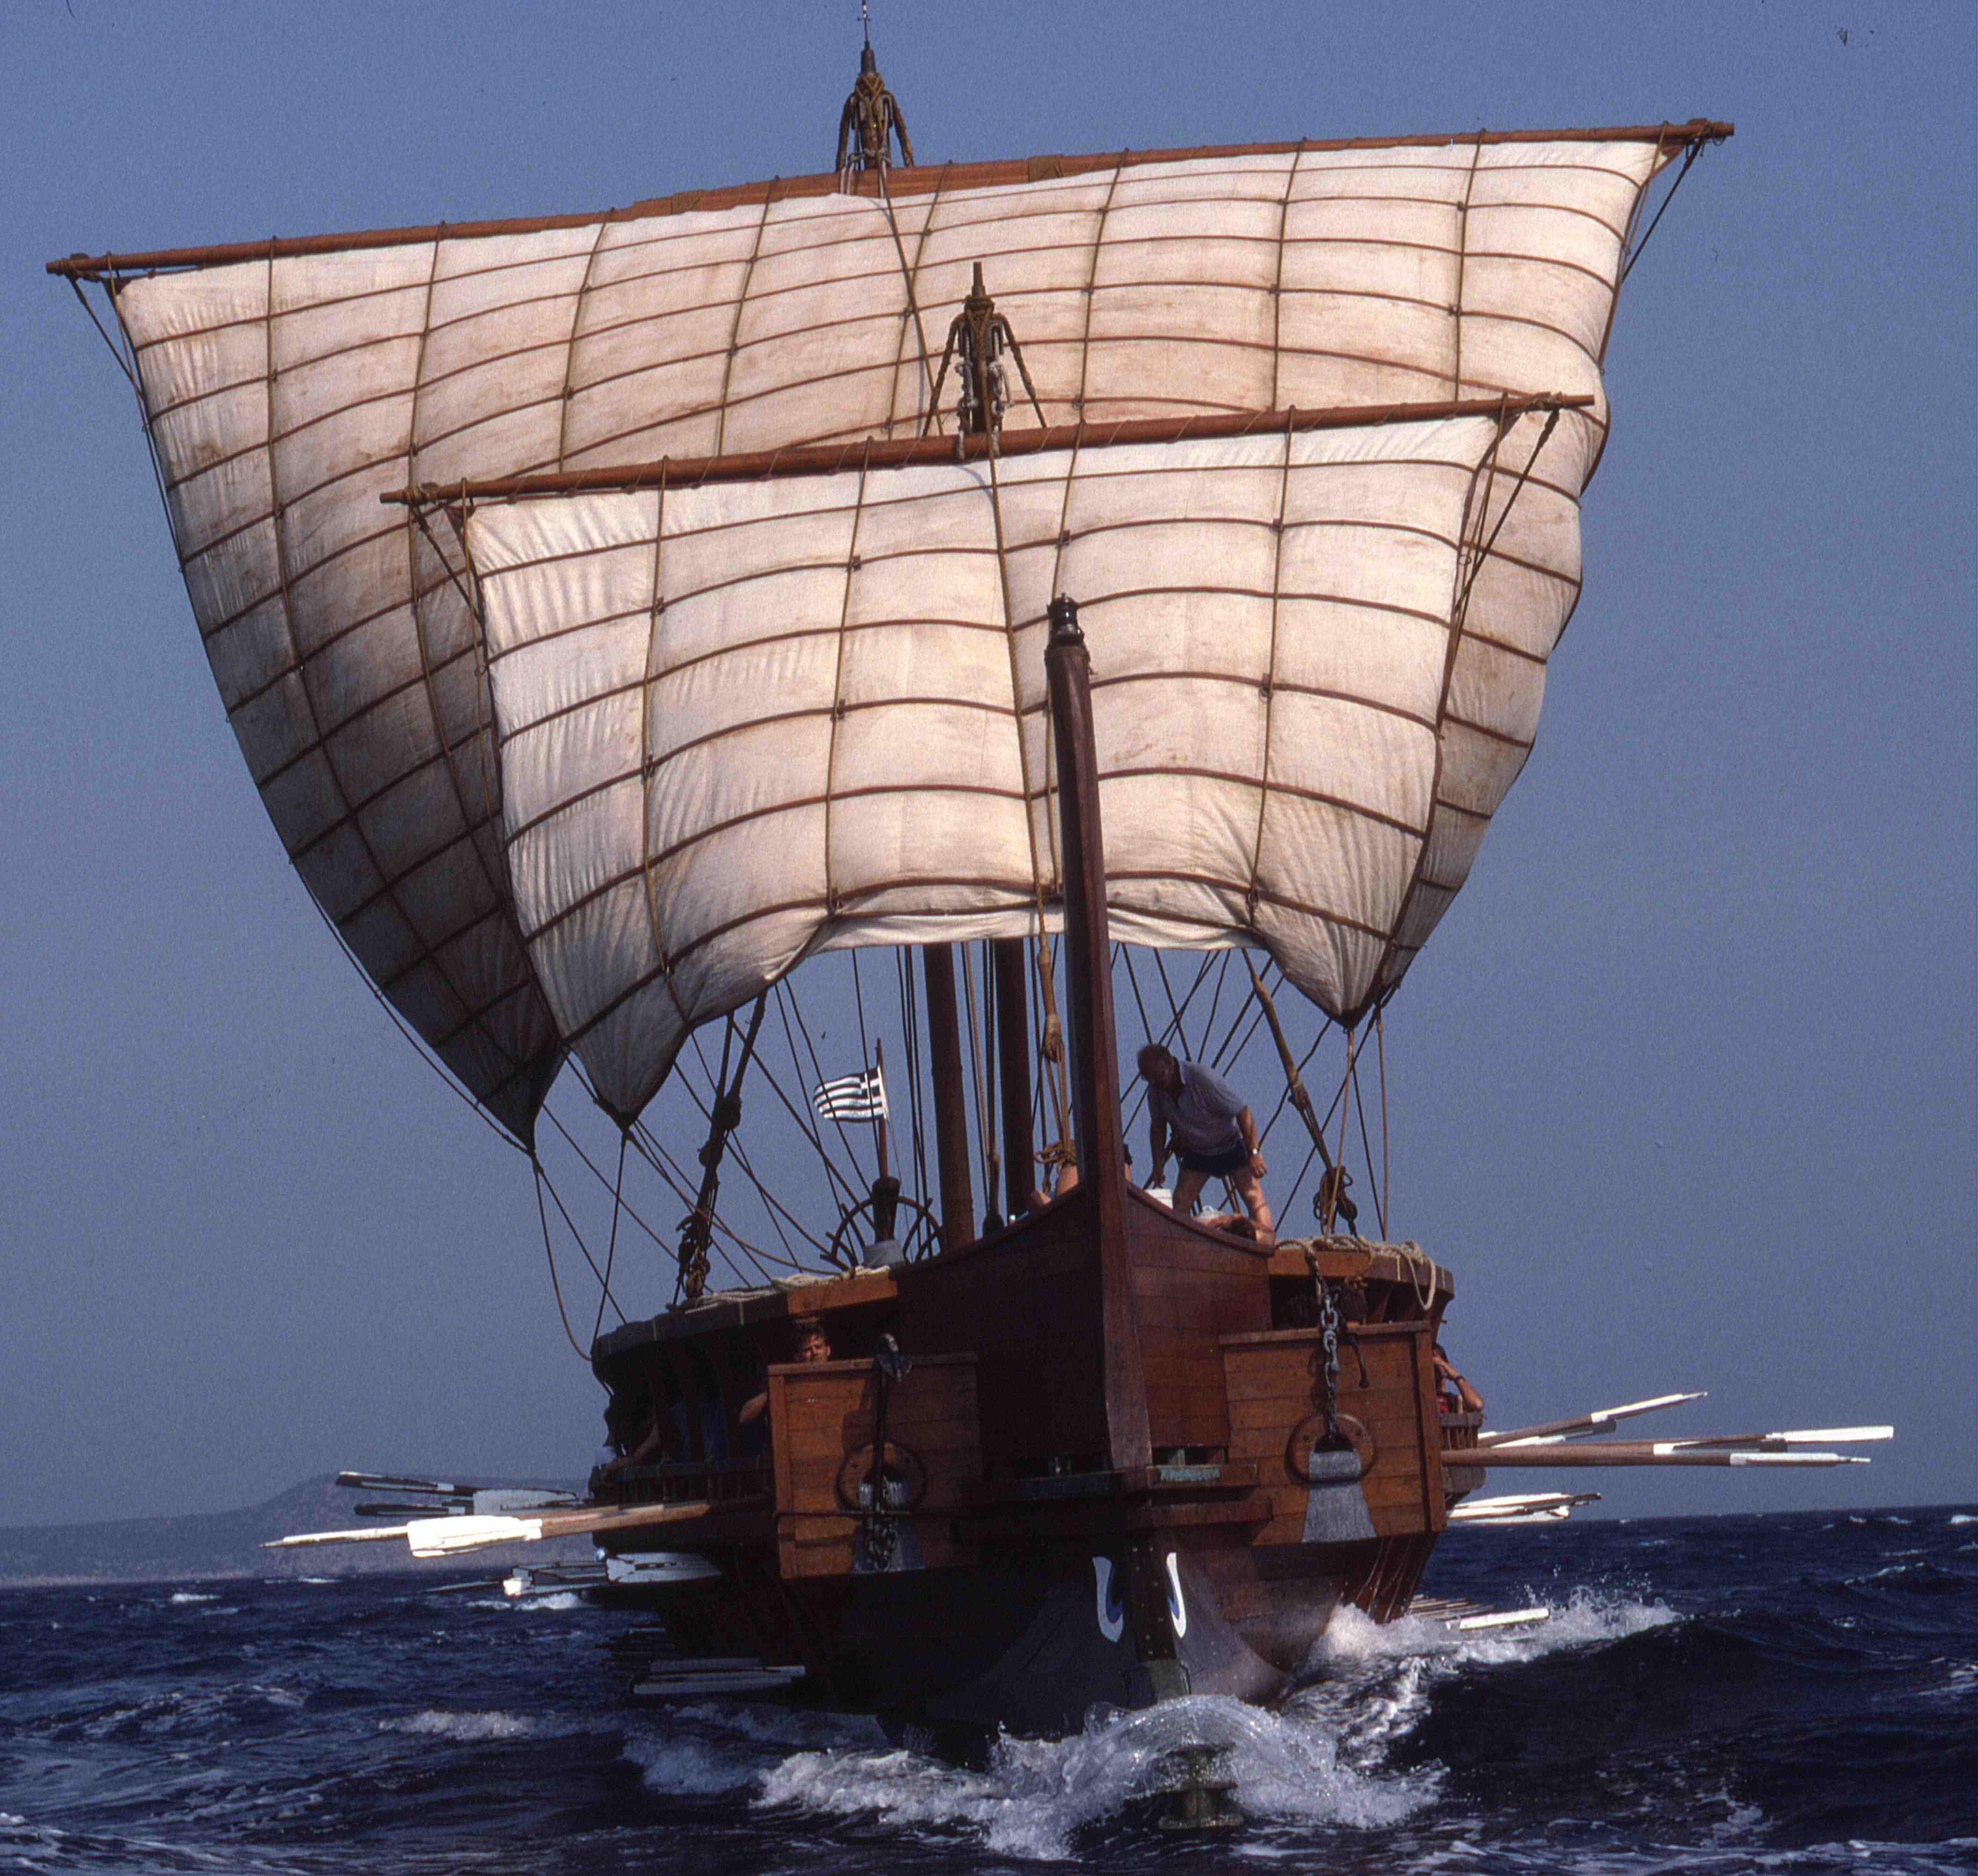 Olympias-under-Sail-Bows-On-R18-21-00b6780